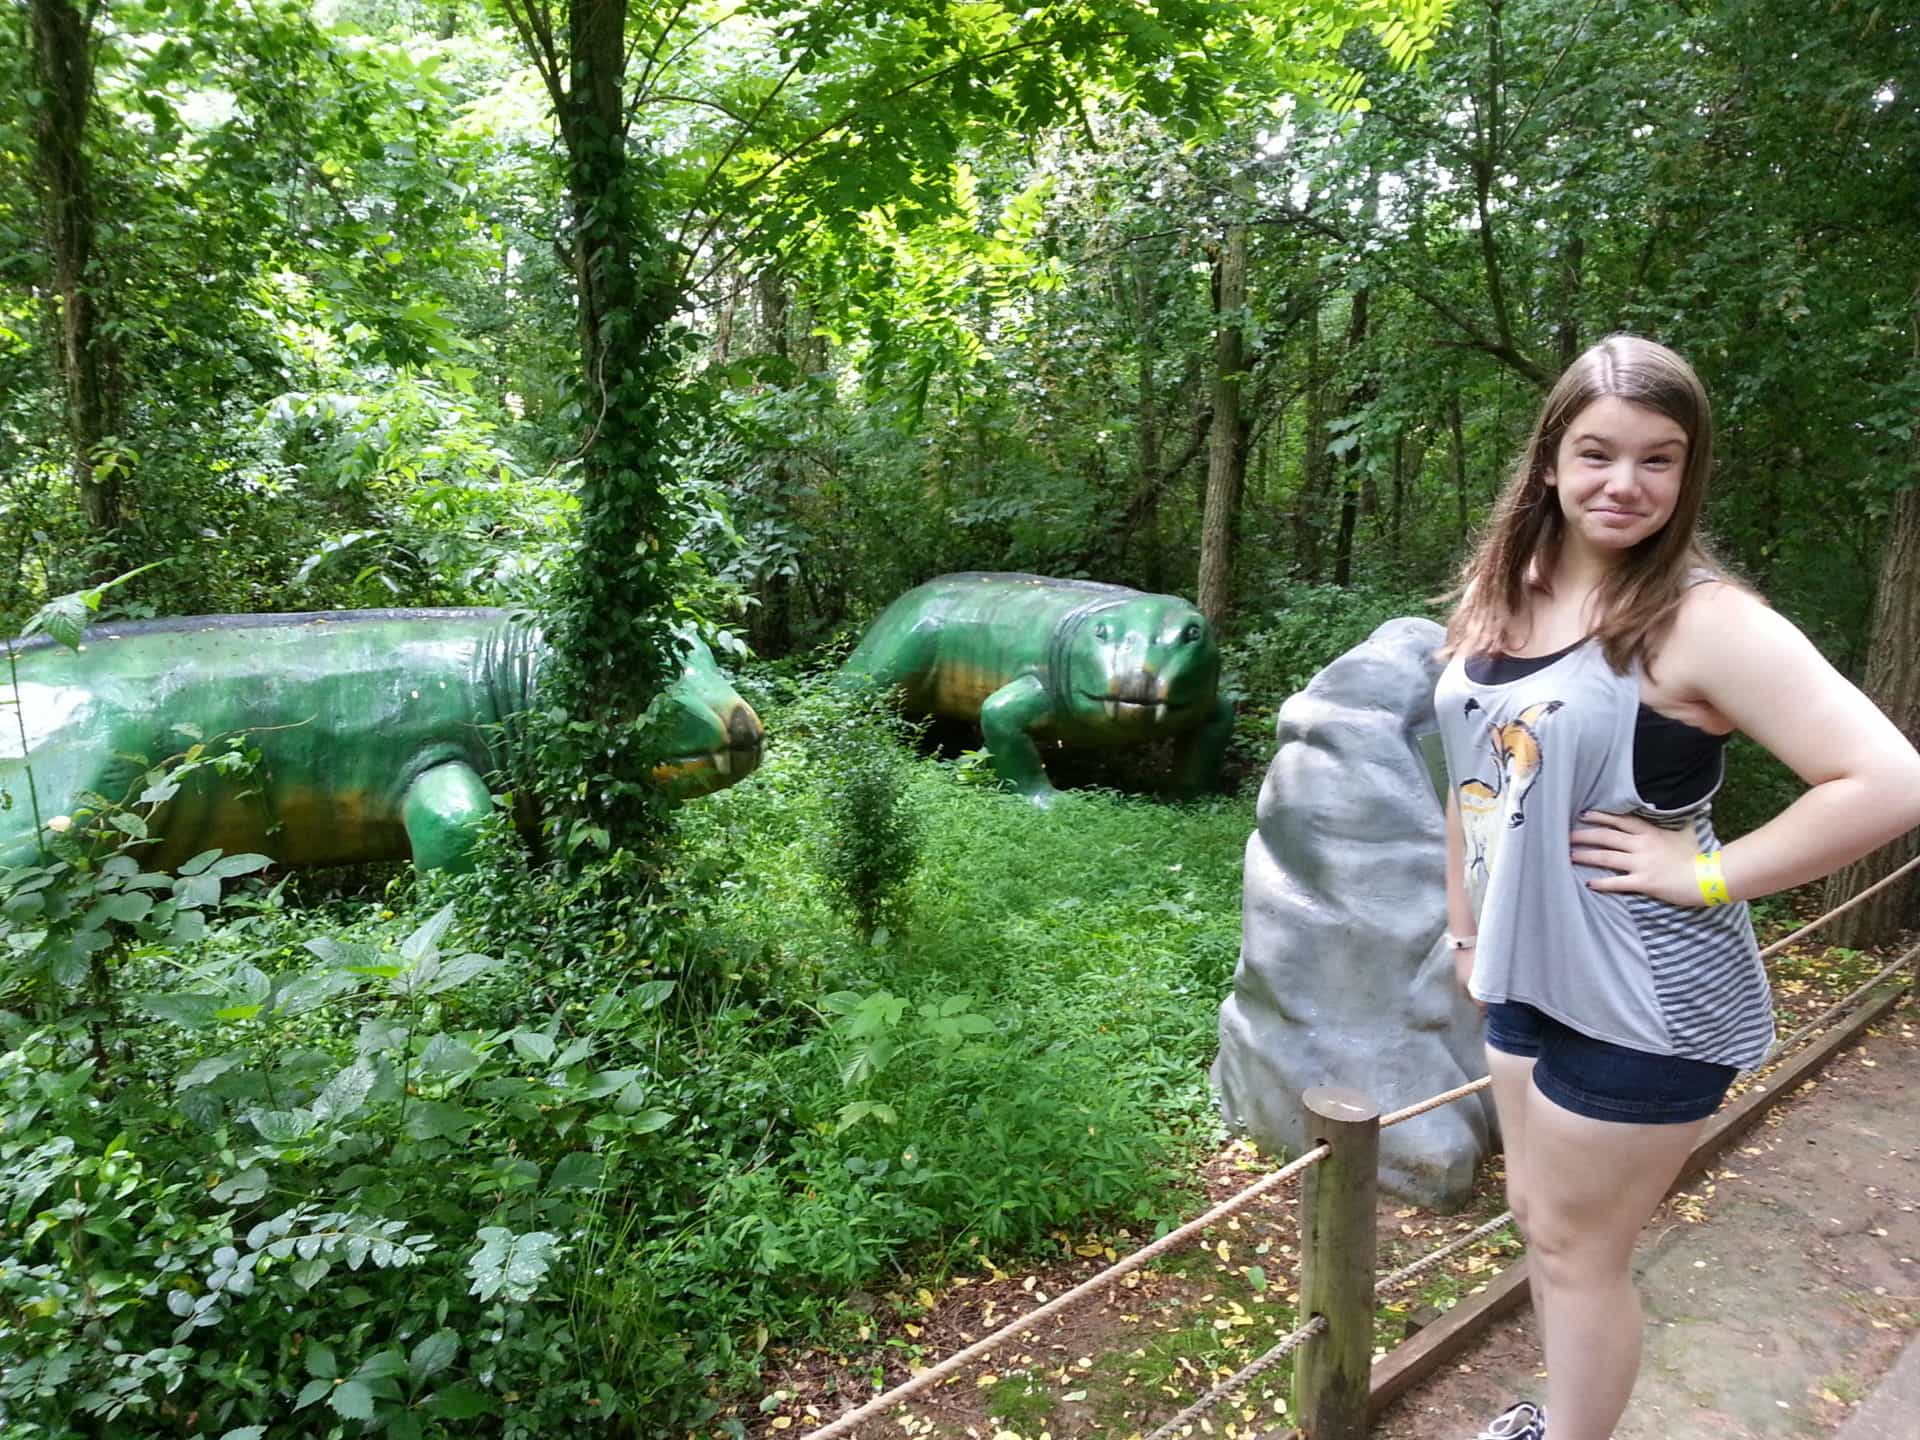 Dinosaur World posing with the Iguanodon